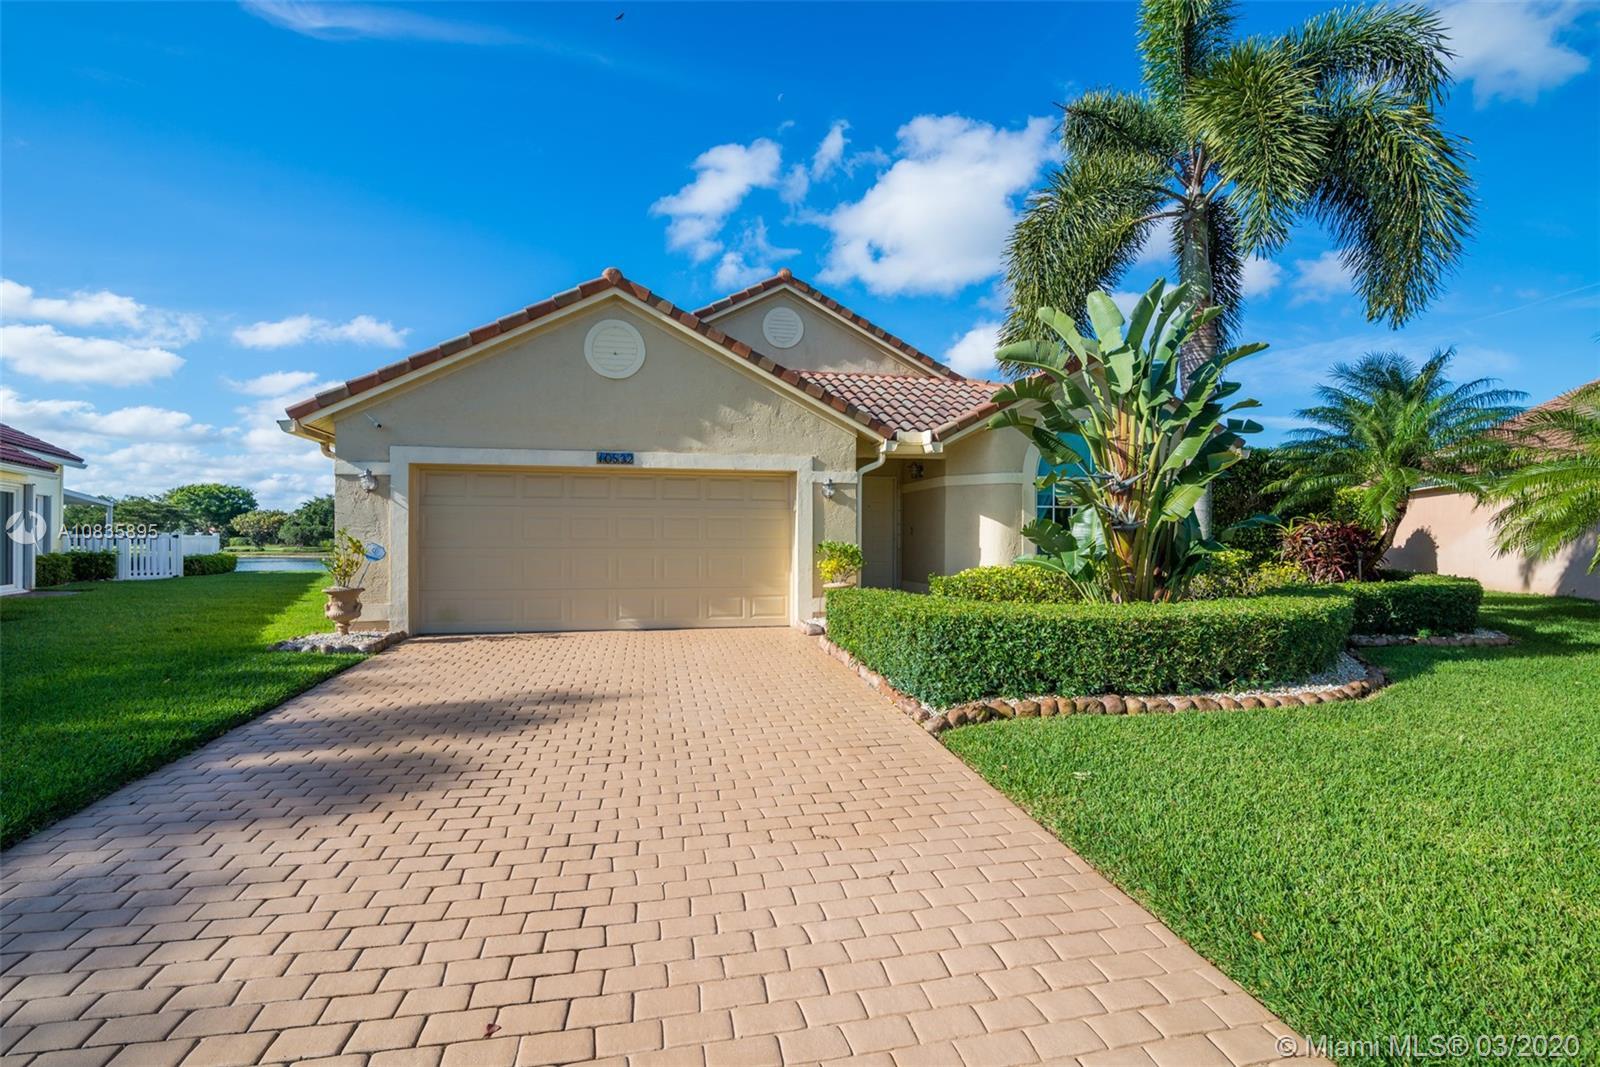 10532 Plainview Cir, Boca Raton, FL 33498